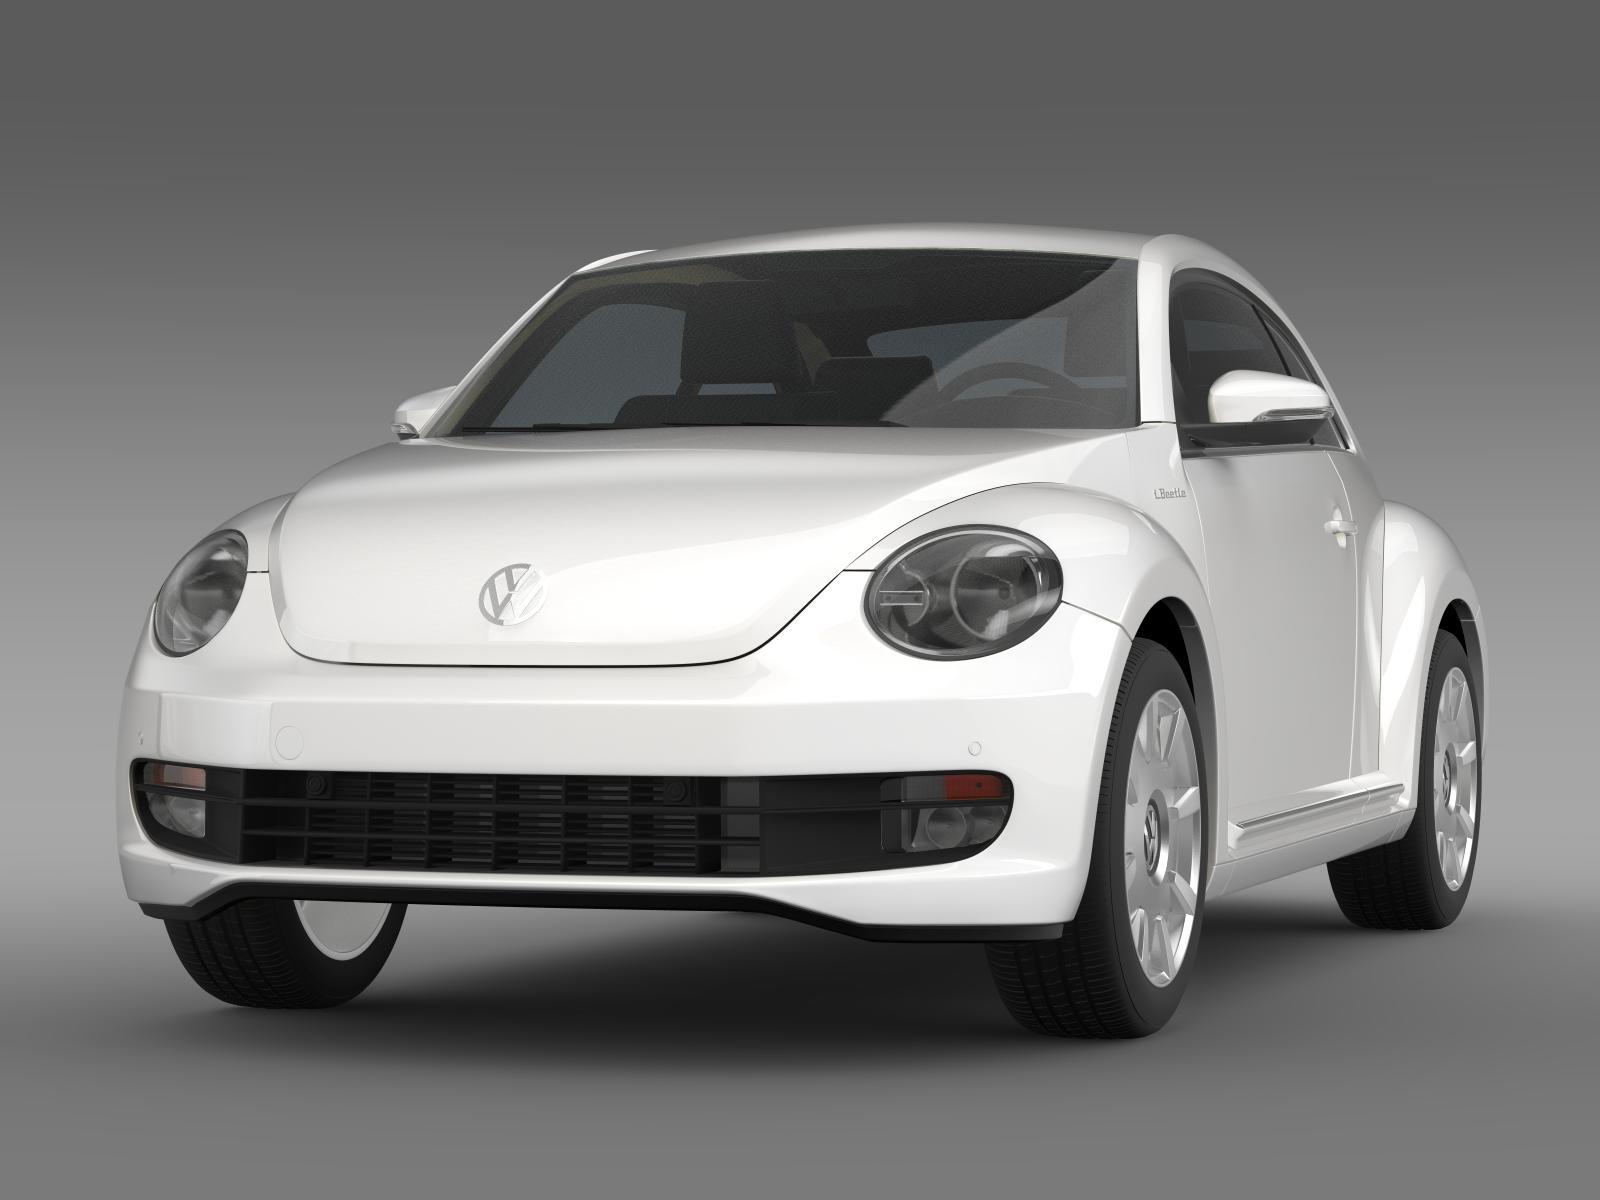 vw i beetle 2015 3d model flatpyramid. Black Bedroom Furniture Sets. Home Design Ideas